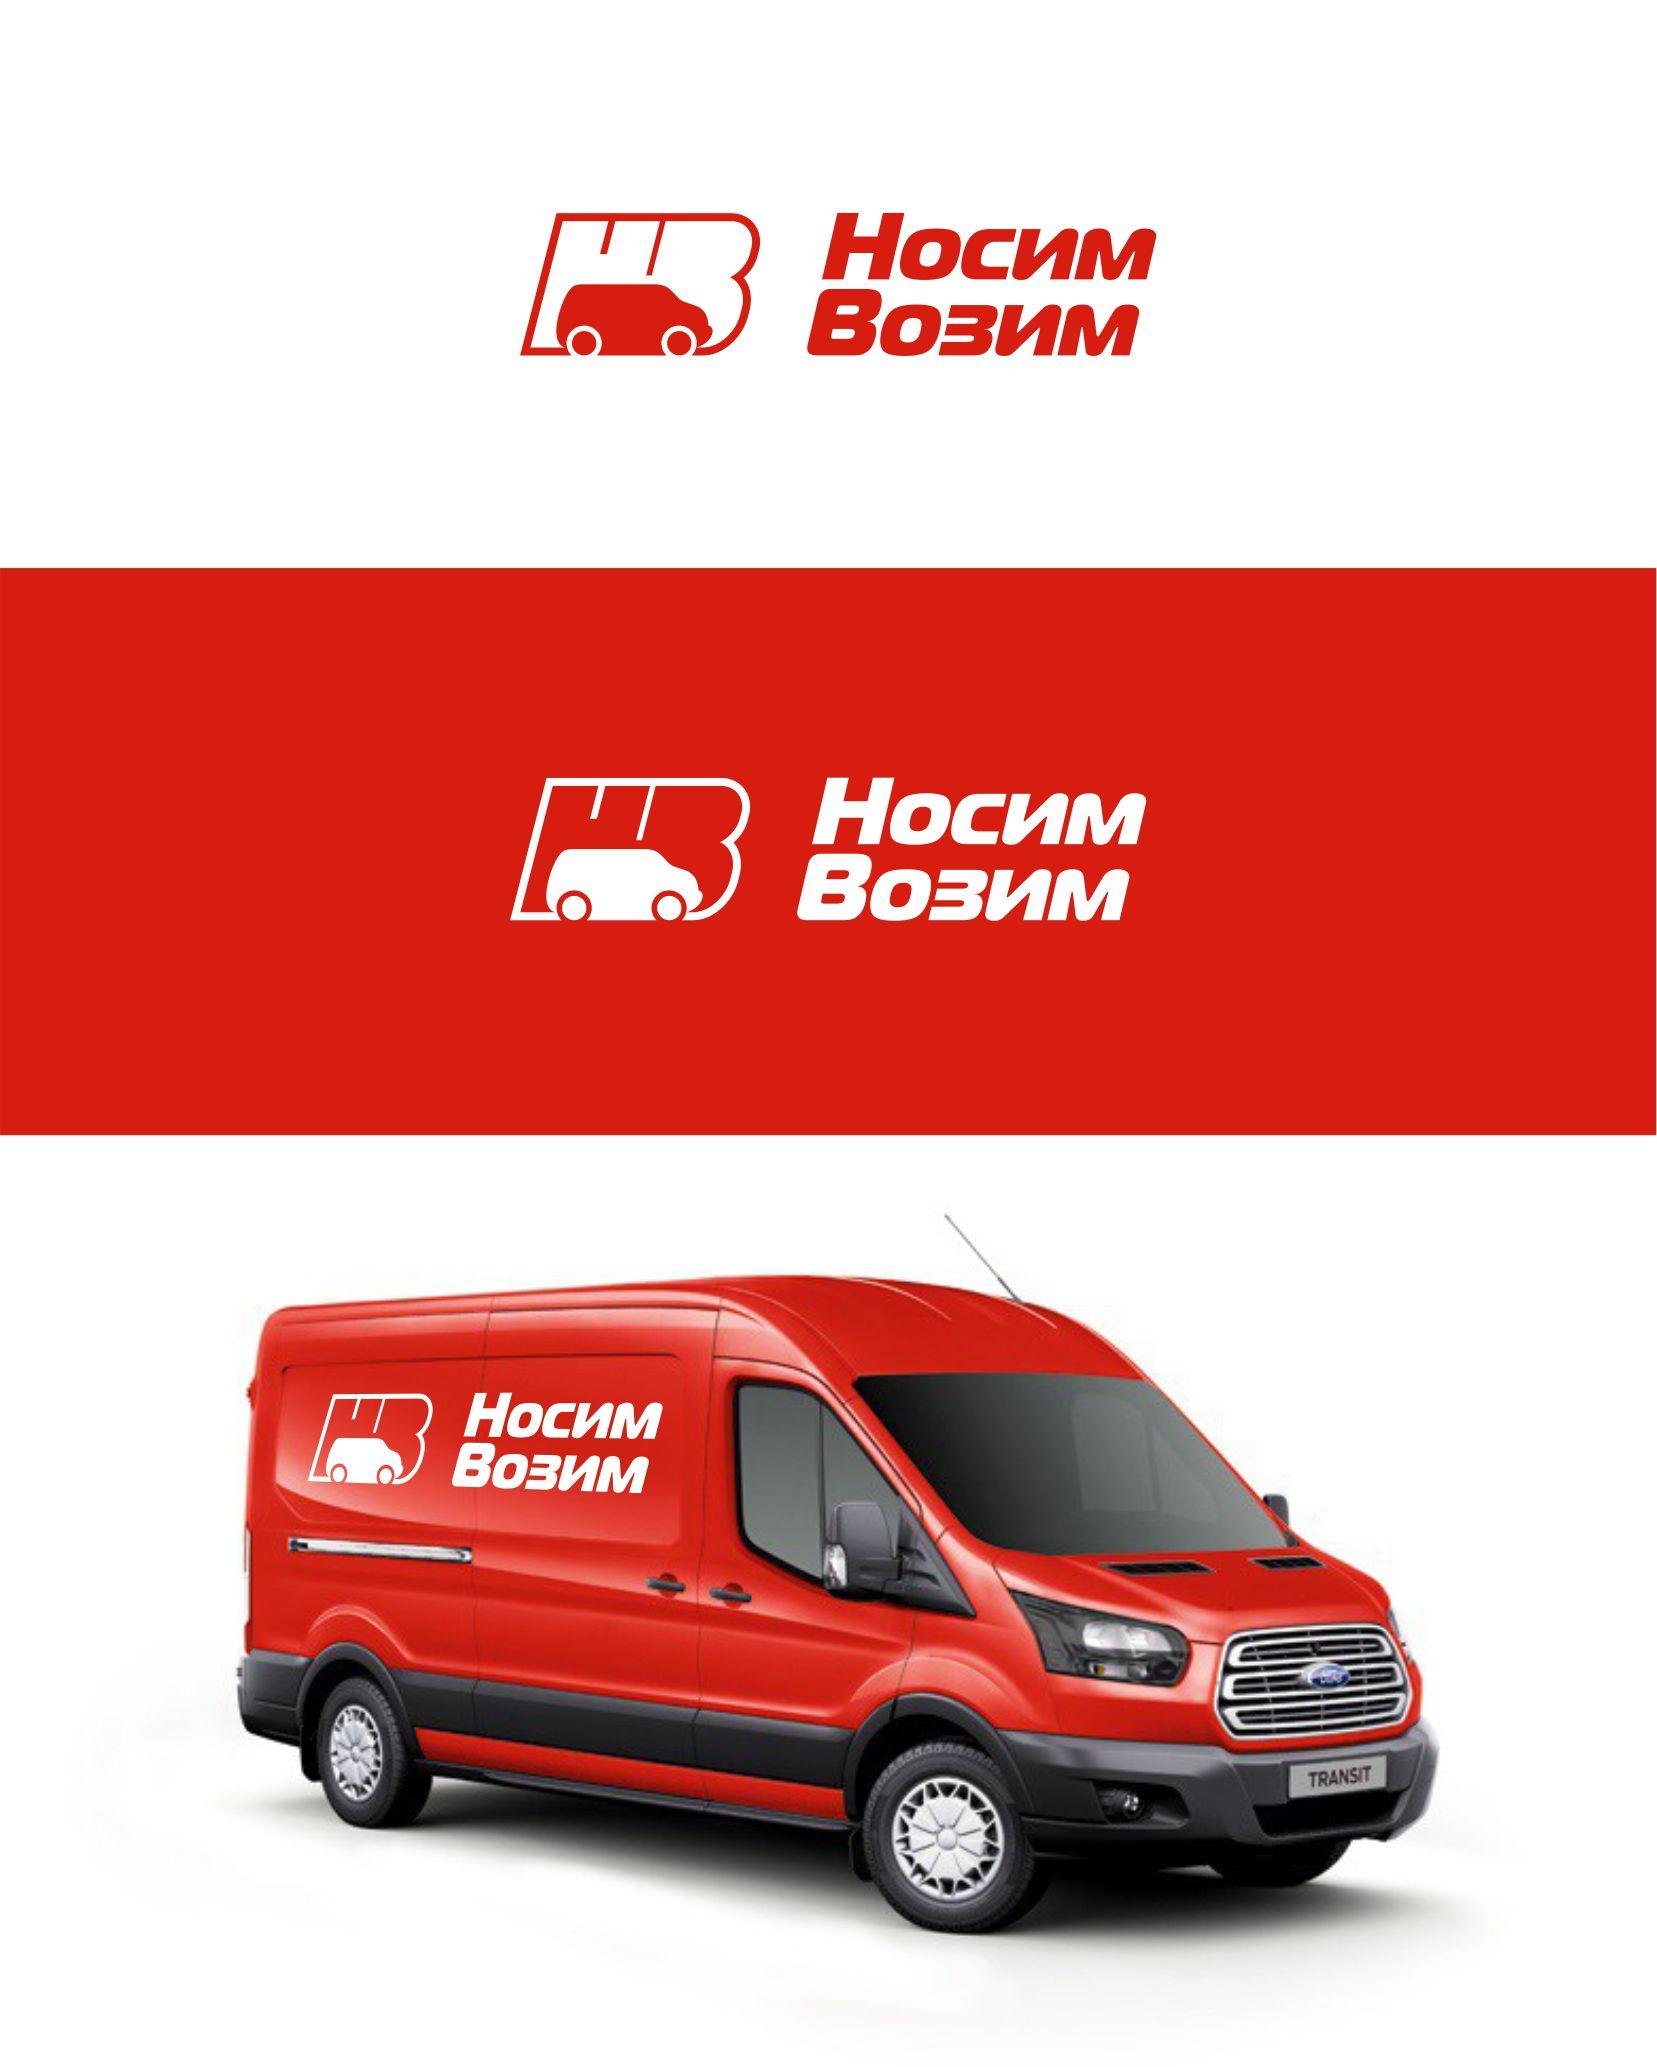 Логотип компании по перевозкам НосимВозим фото f_4495cf7bc51c4a33.jpg